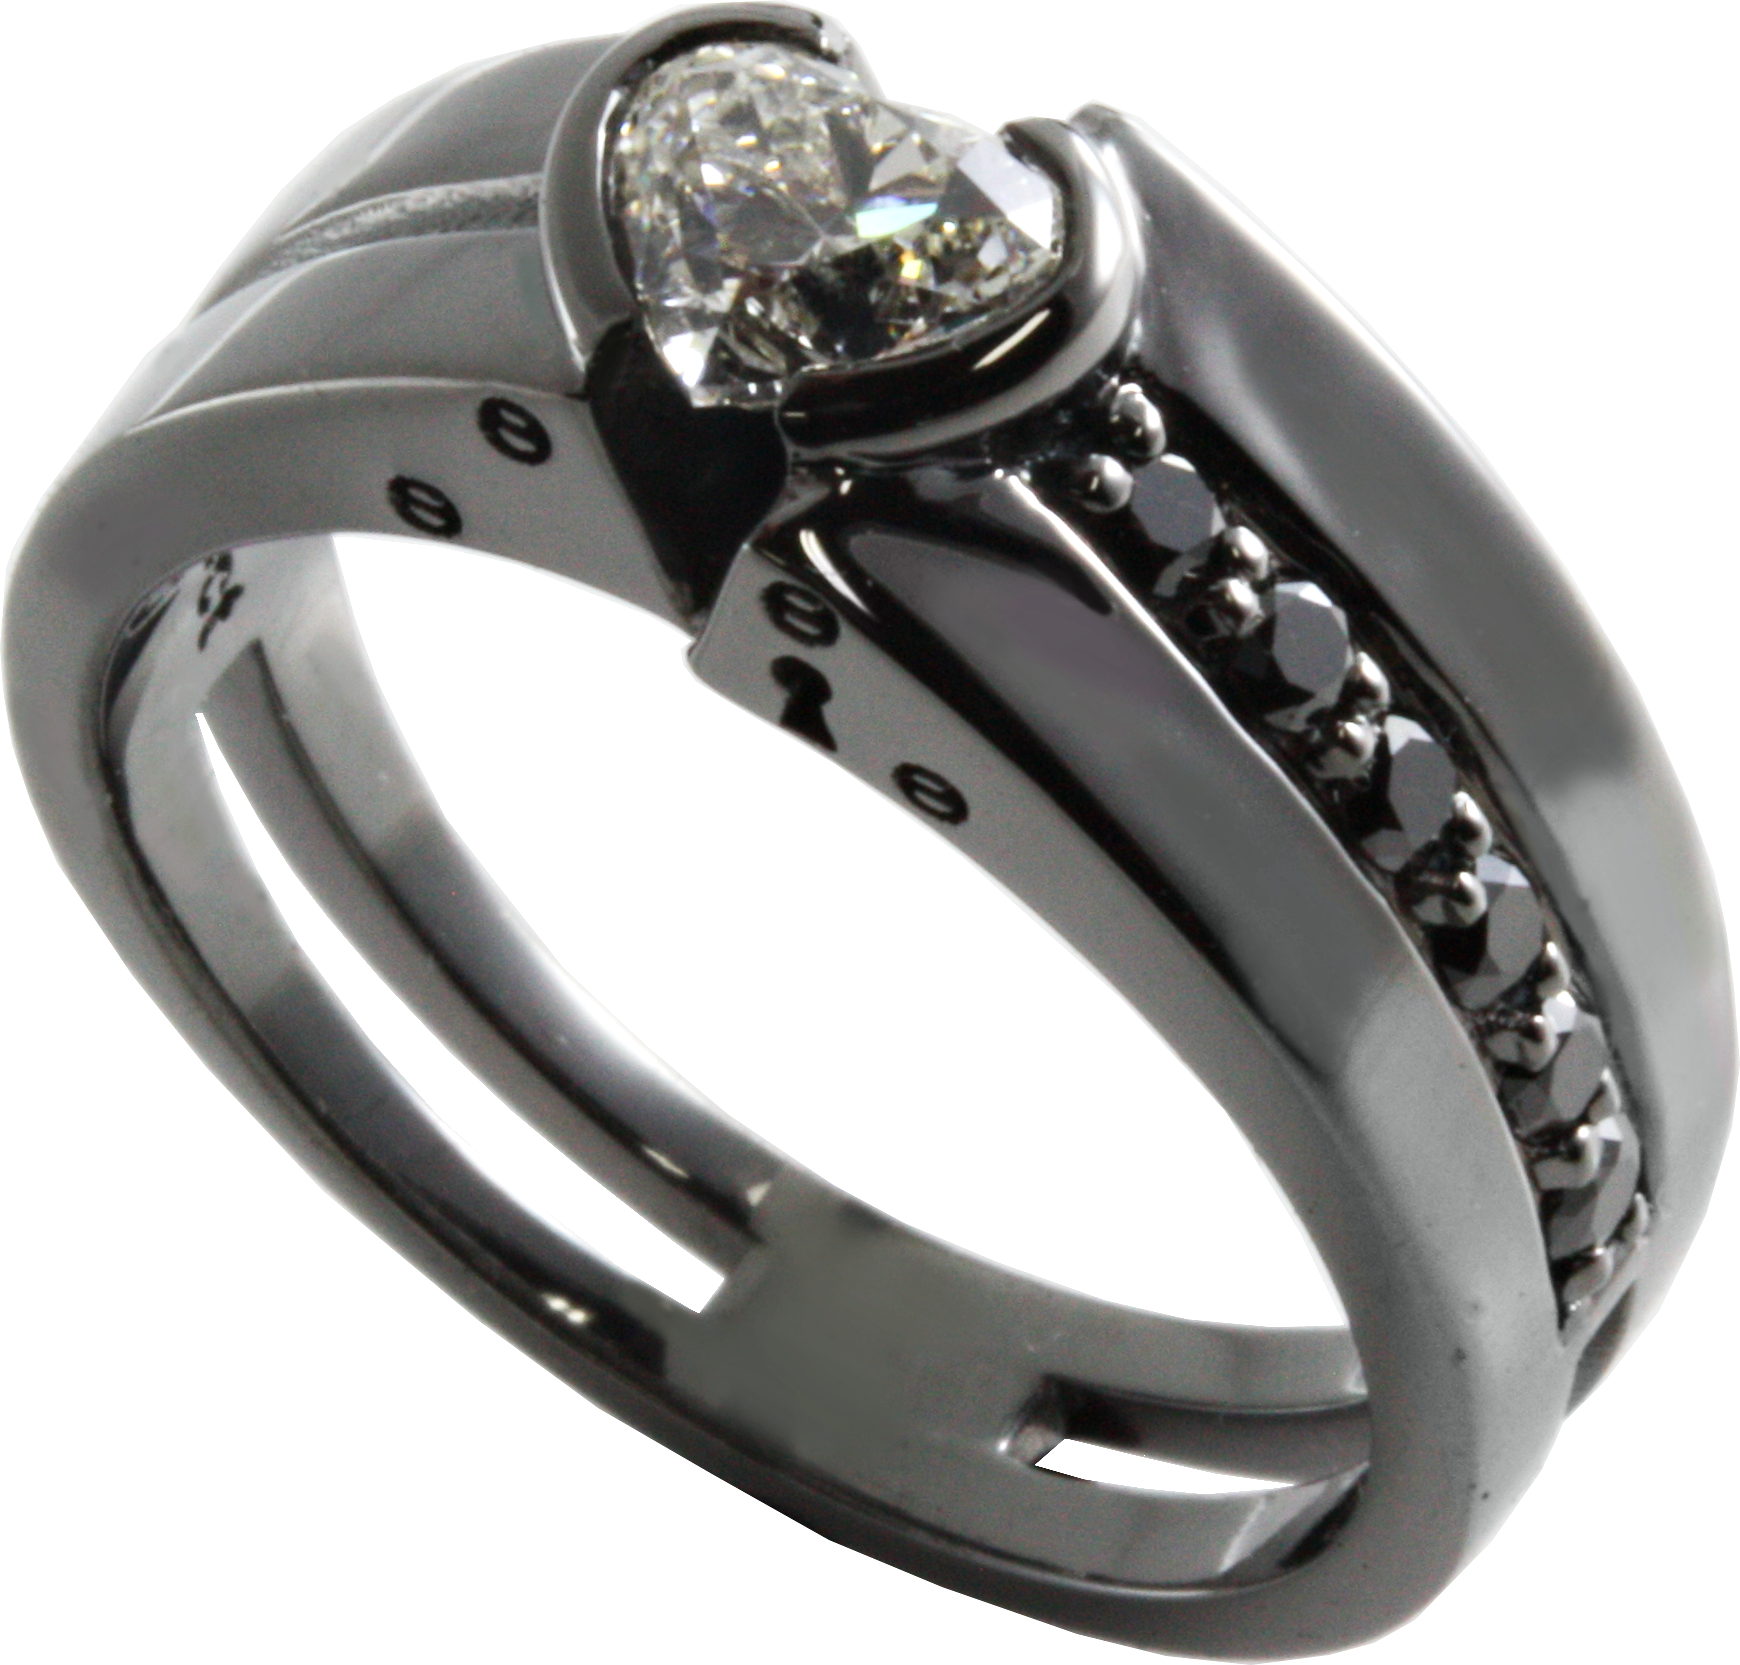 Engagement clipart bachelorette ring. Inspirational black diamond sydney